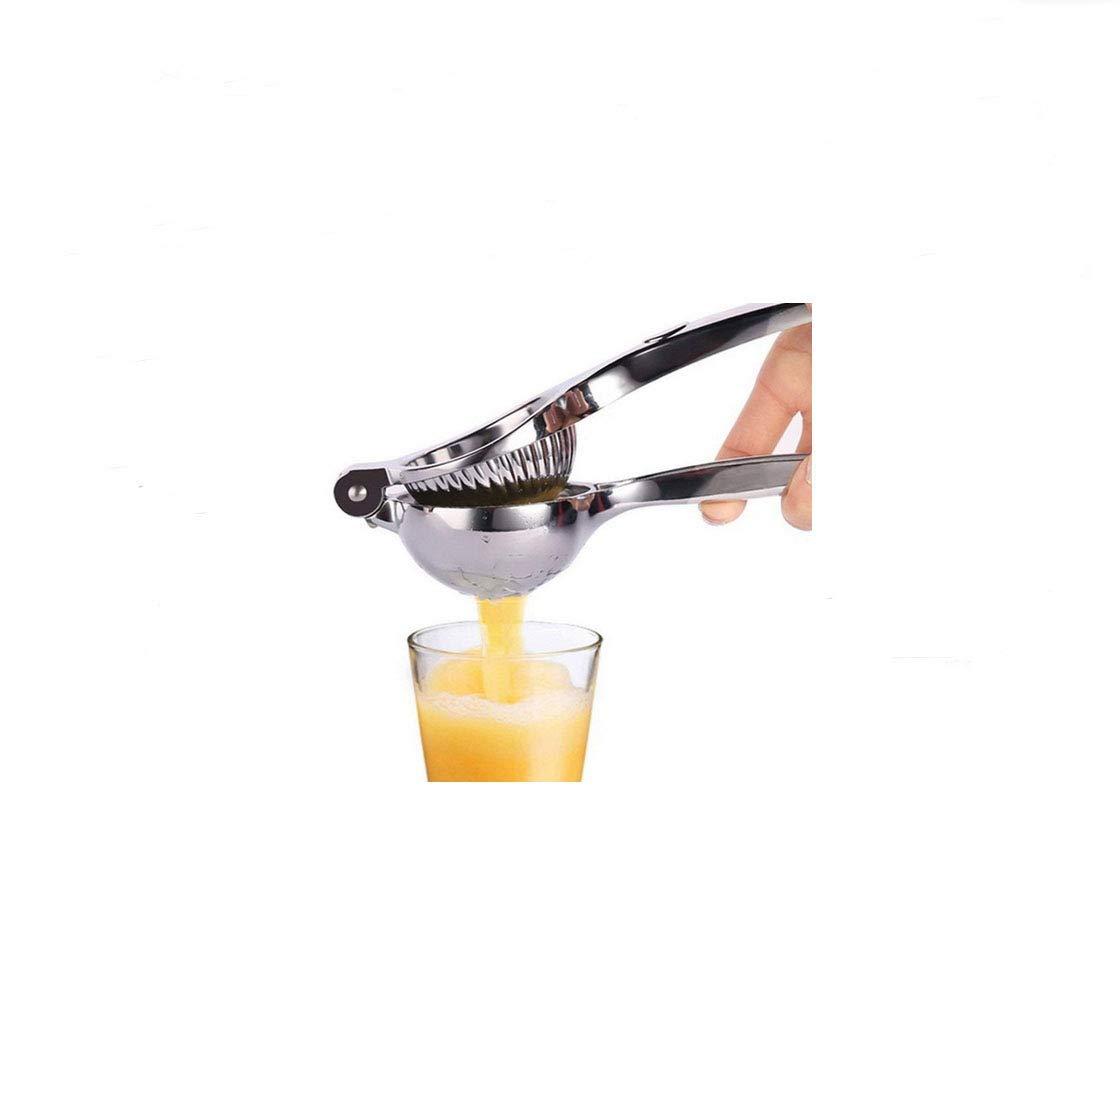 Vintage Hand Press Manual Juicer Orange Lemon Lime Squeezer Kitchen Cookware fresh juice tool